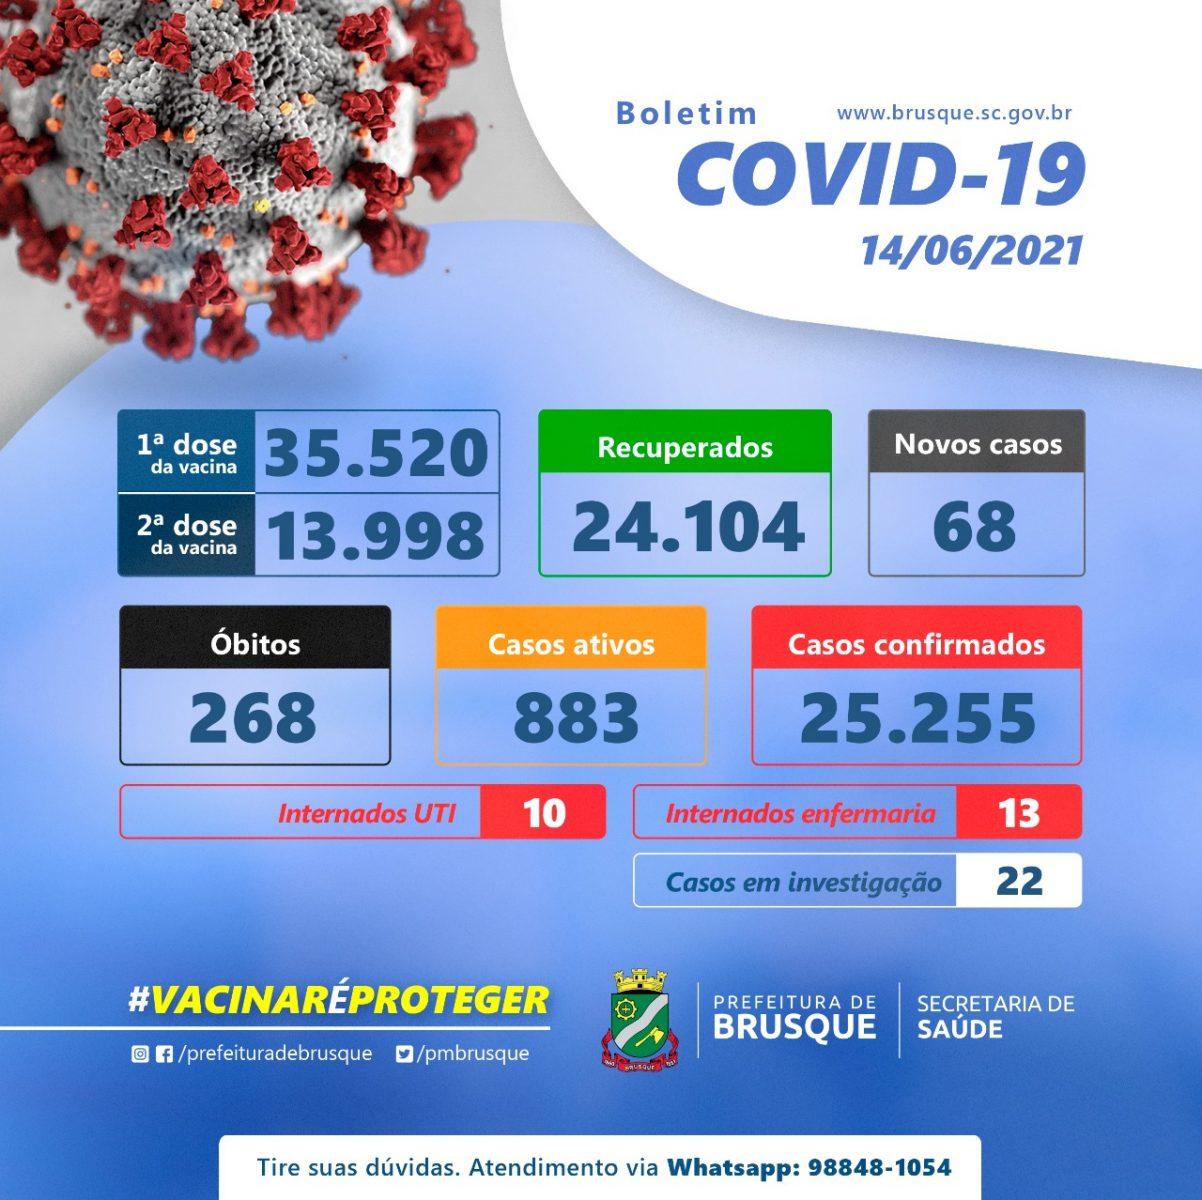 Covid-19: Confira o boletim epidemiológico desta segunda-feira (14)